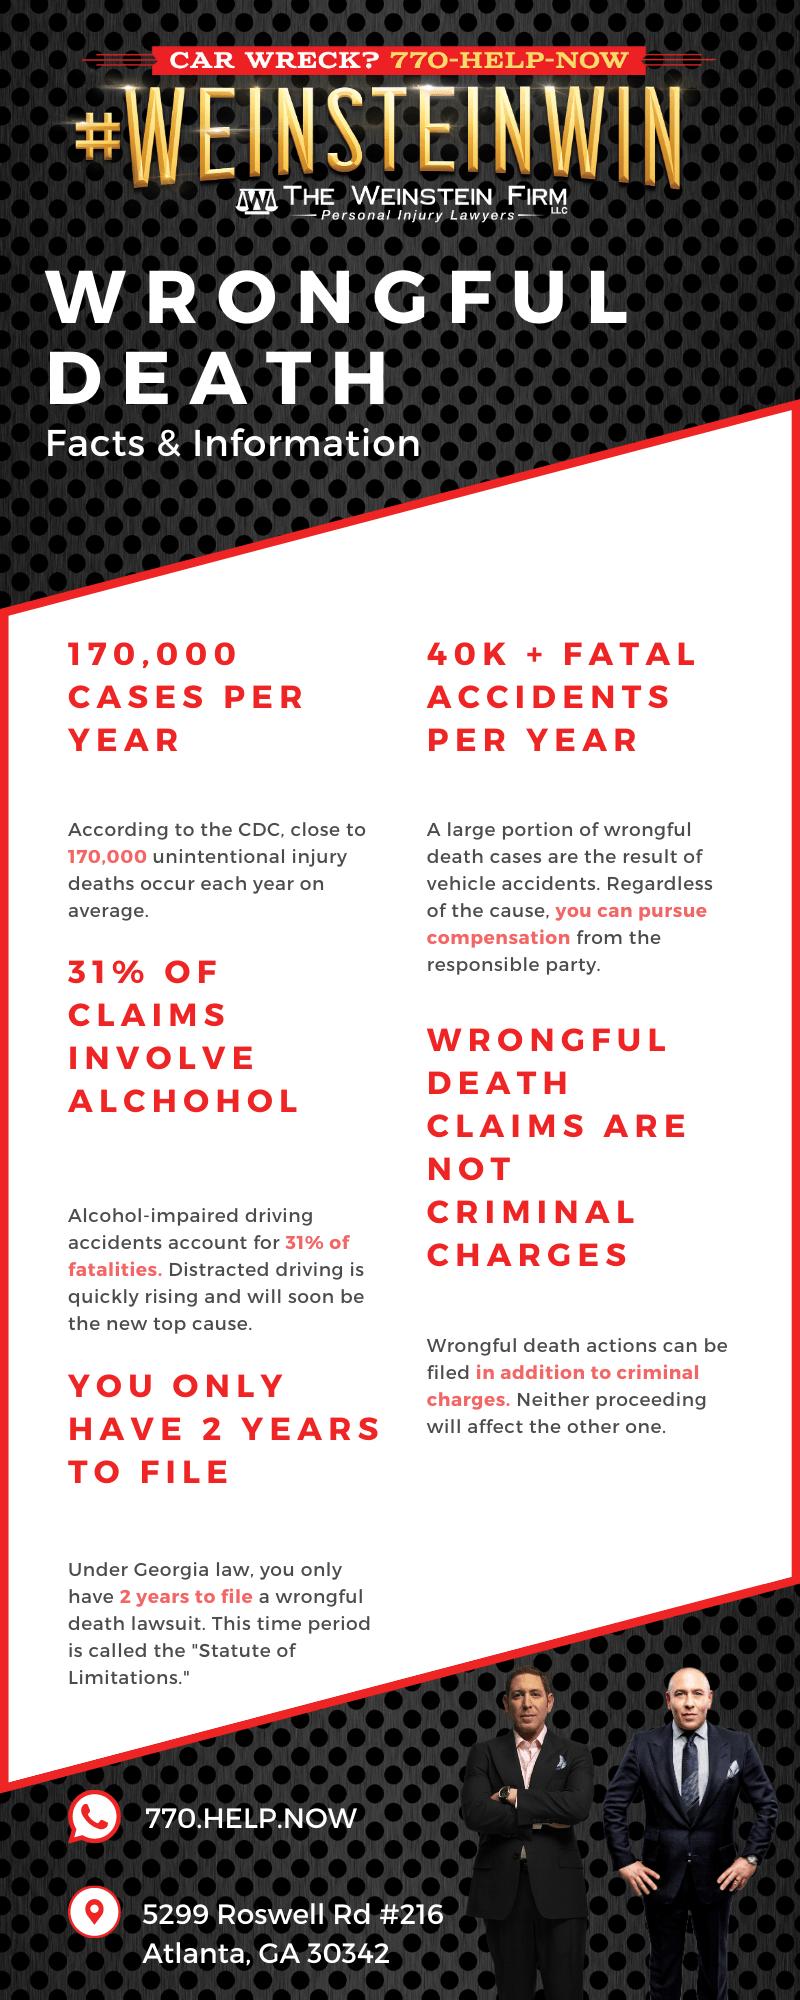 Atlanta Wrongful Death Facts & Information